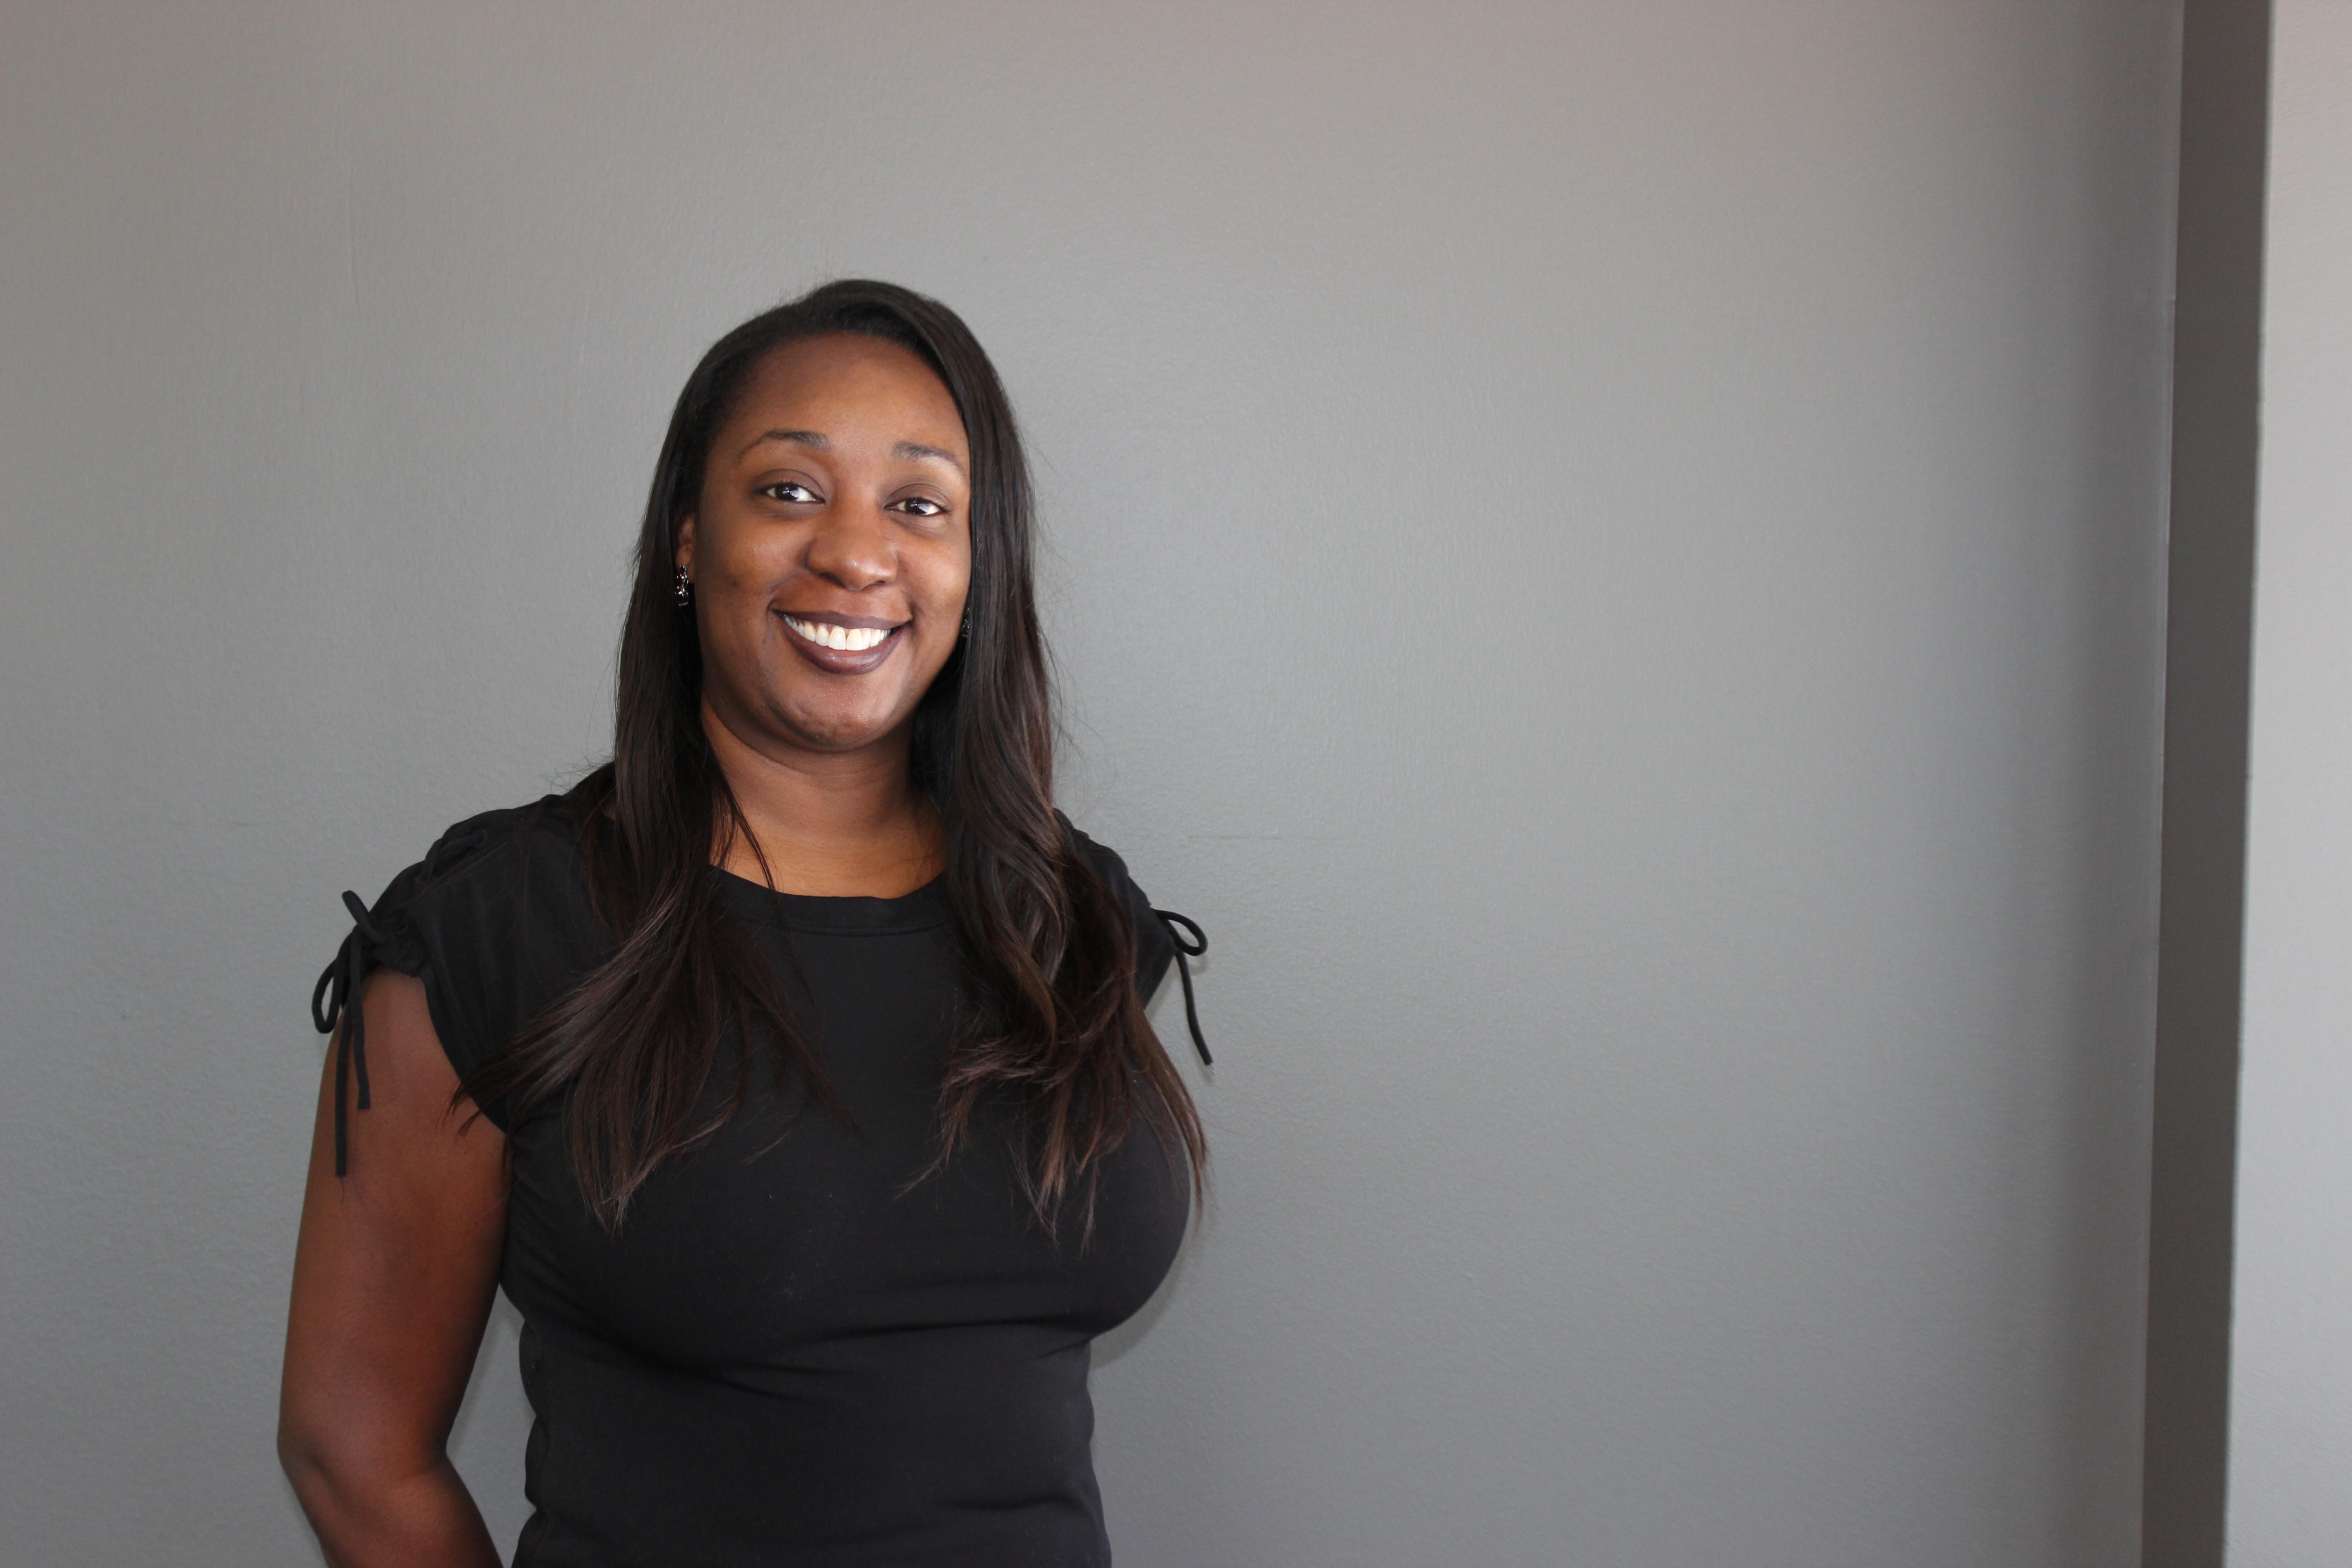 Meet Joy Gardner, LegalEASE's Manager of Member Services